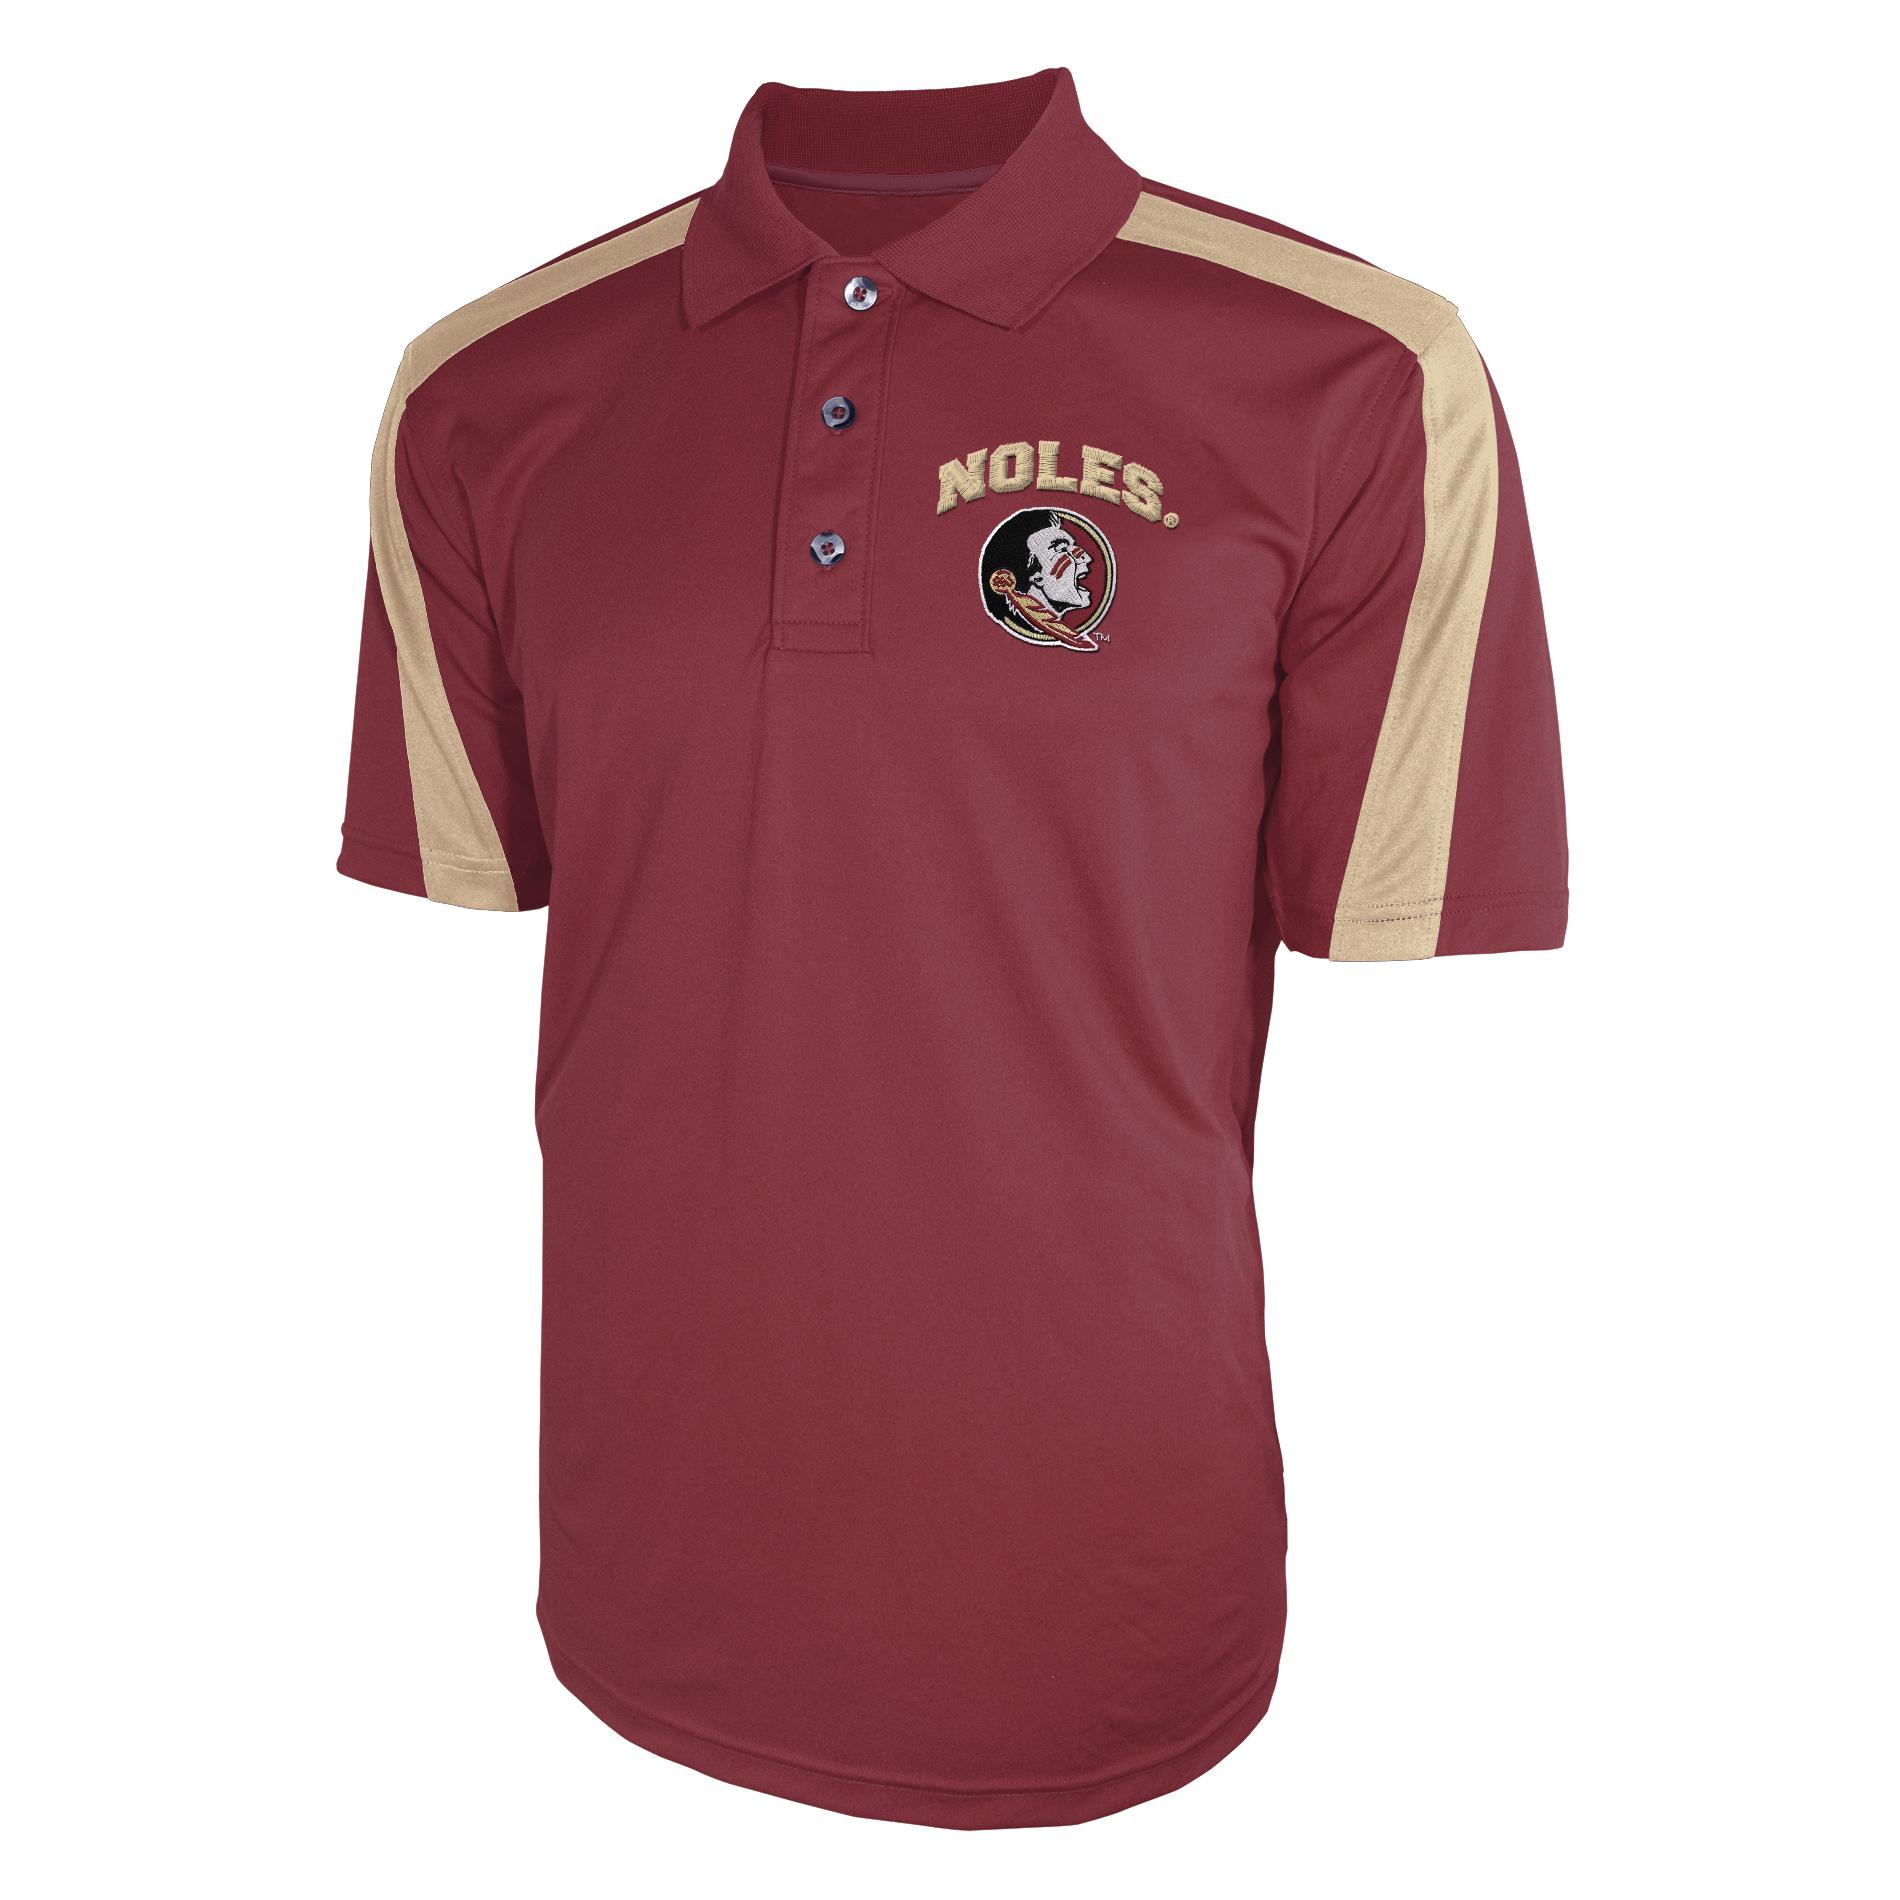 NCAA Men's Big & Tall Polo Shirt - Florida State University Seminoles PartNumber: 046VA90147112P MfgPartNumber: 7AXEE33KMFFDTC